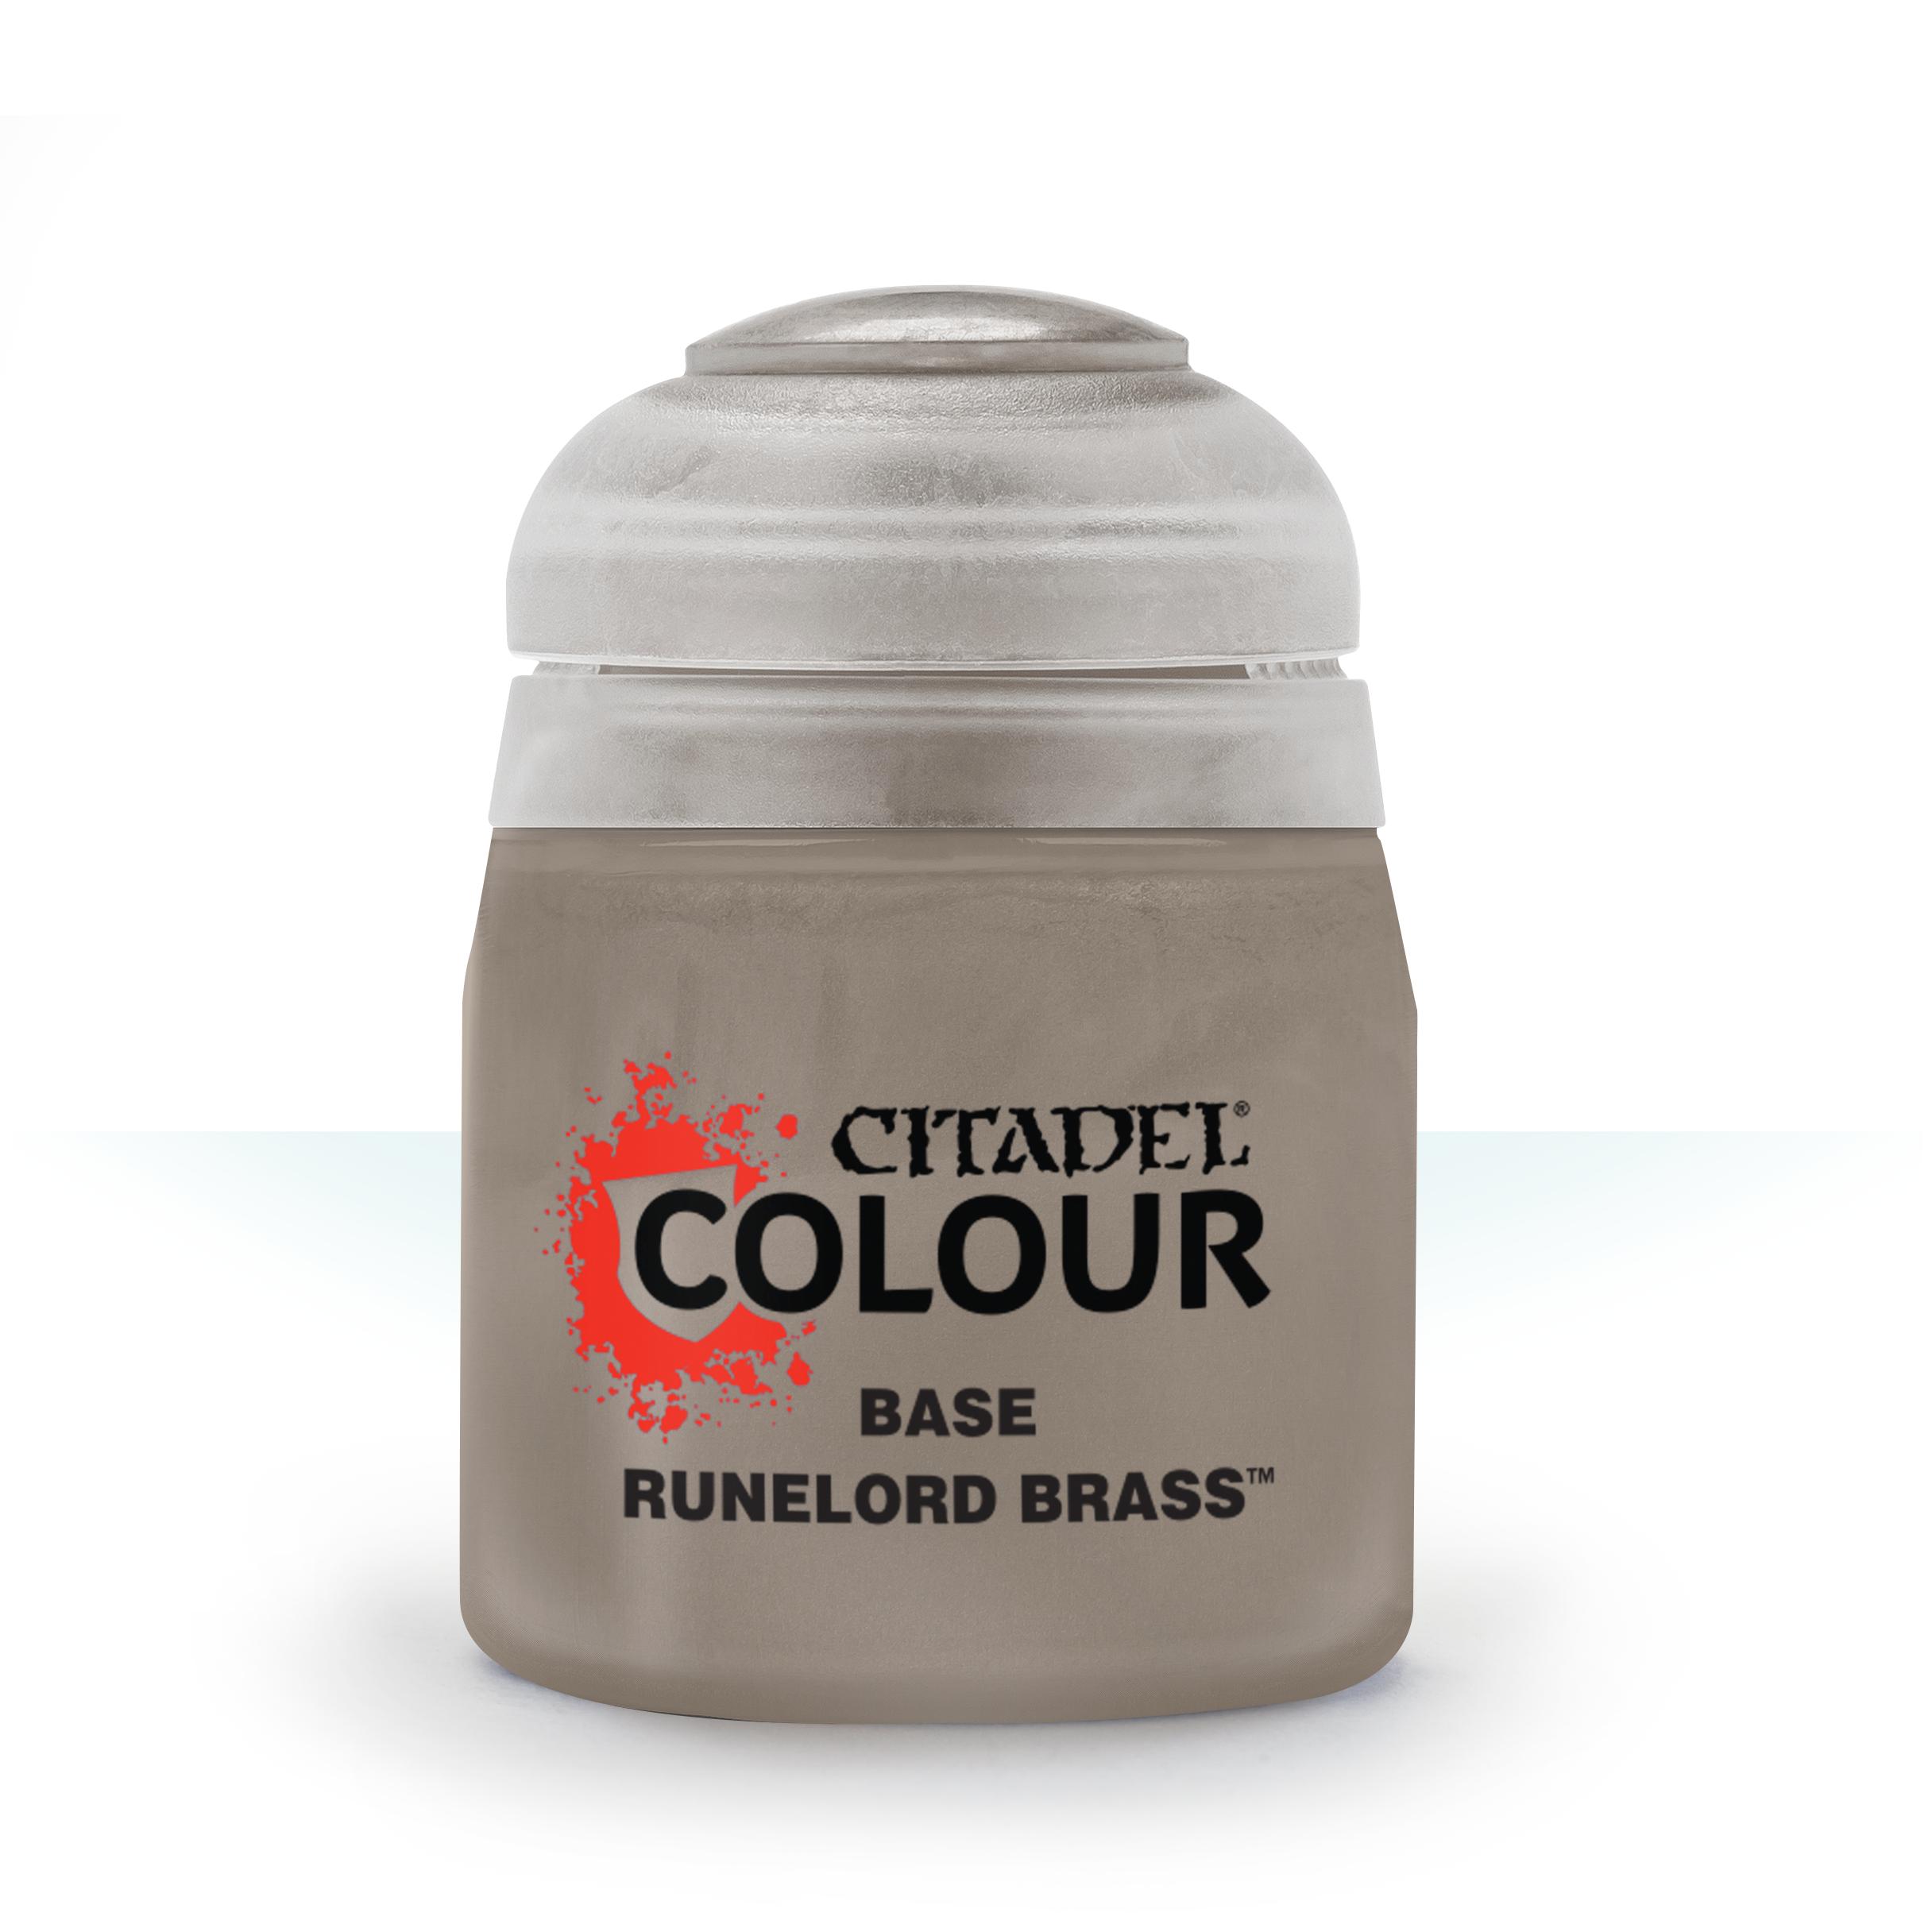 Base Runelord Brass